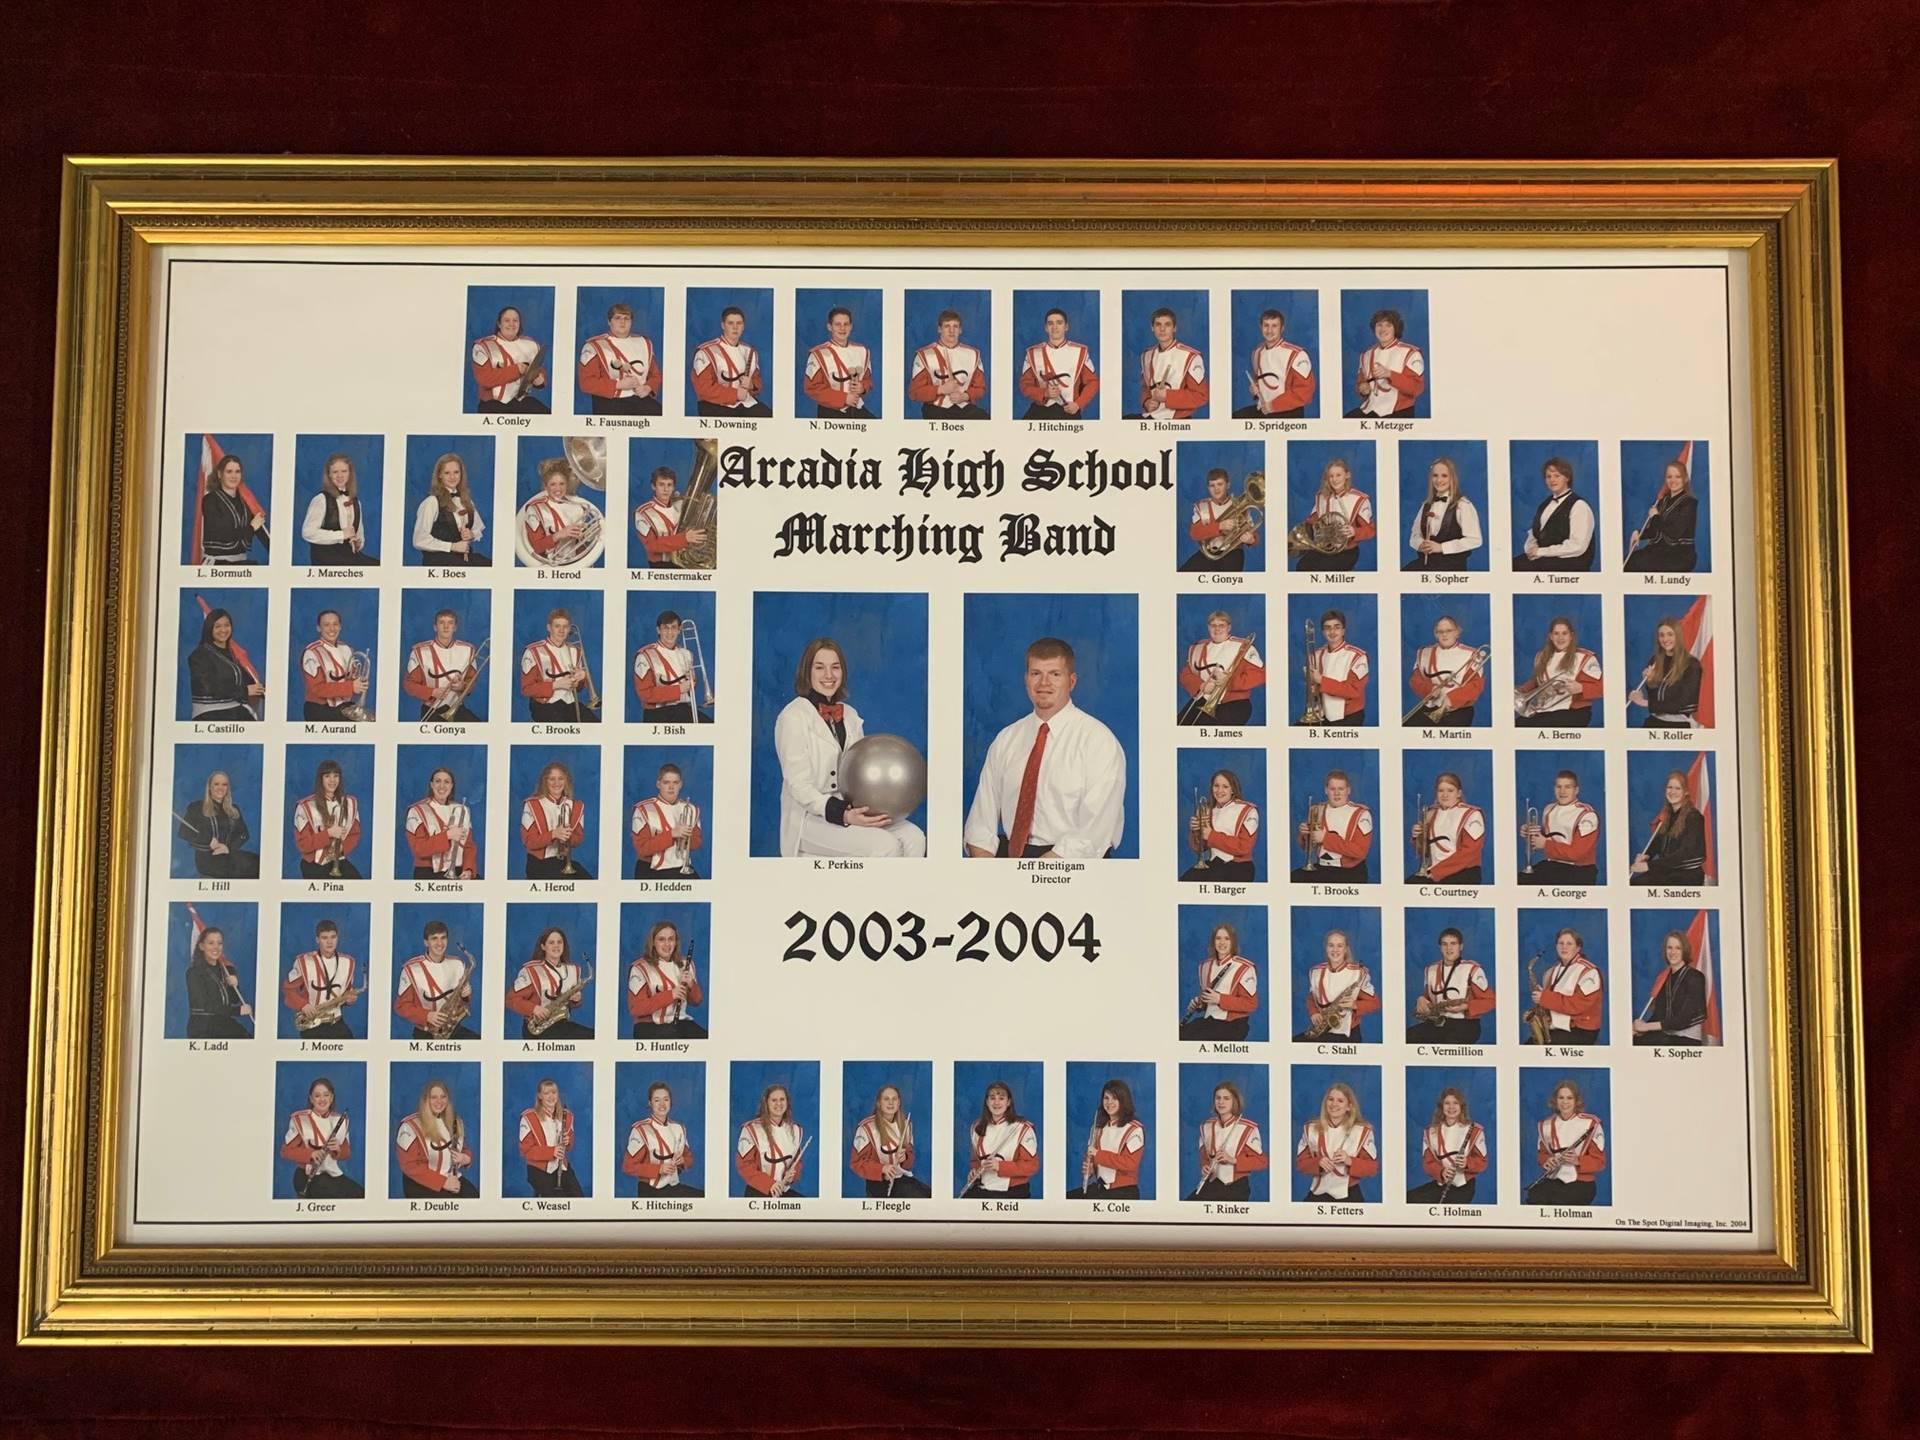 Arcadia High School Marching Band 2003-2004